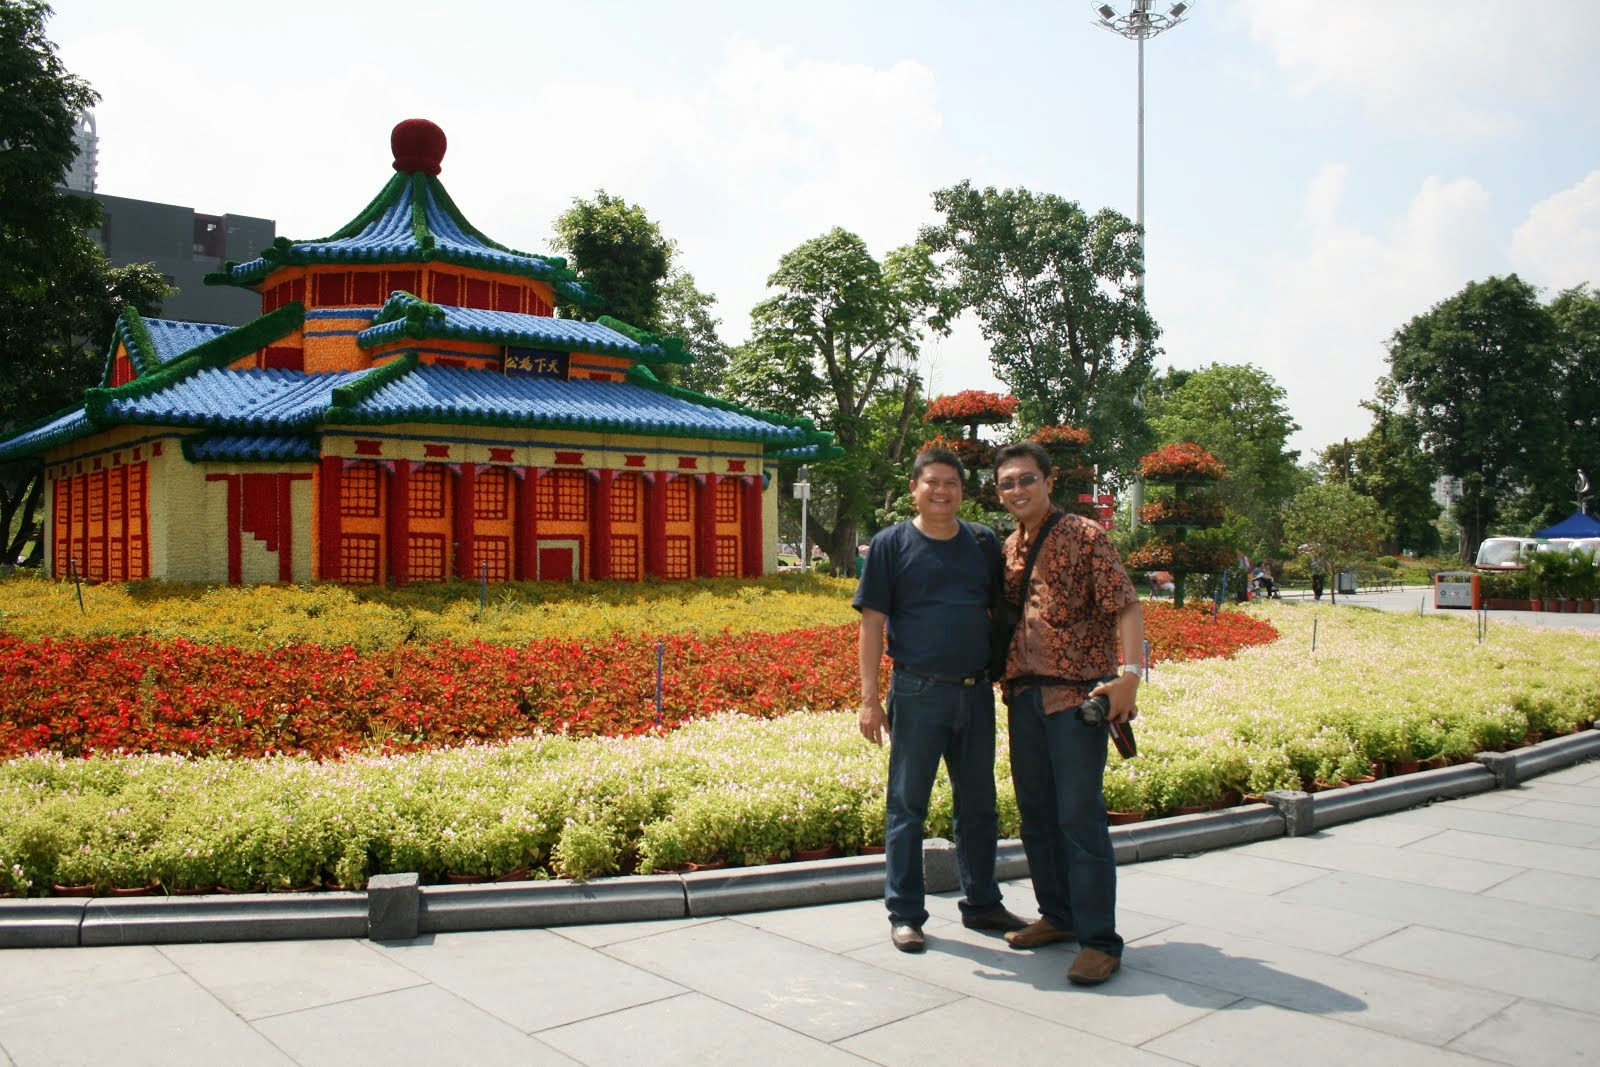 Bersama Agus Setiawan (Dekan FISS), China. 2011